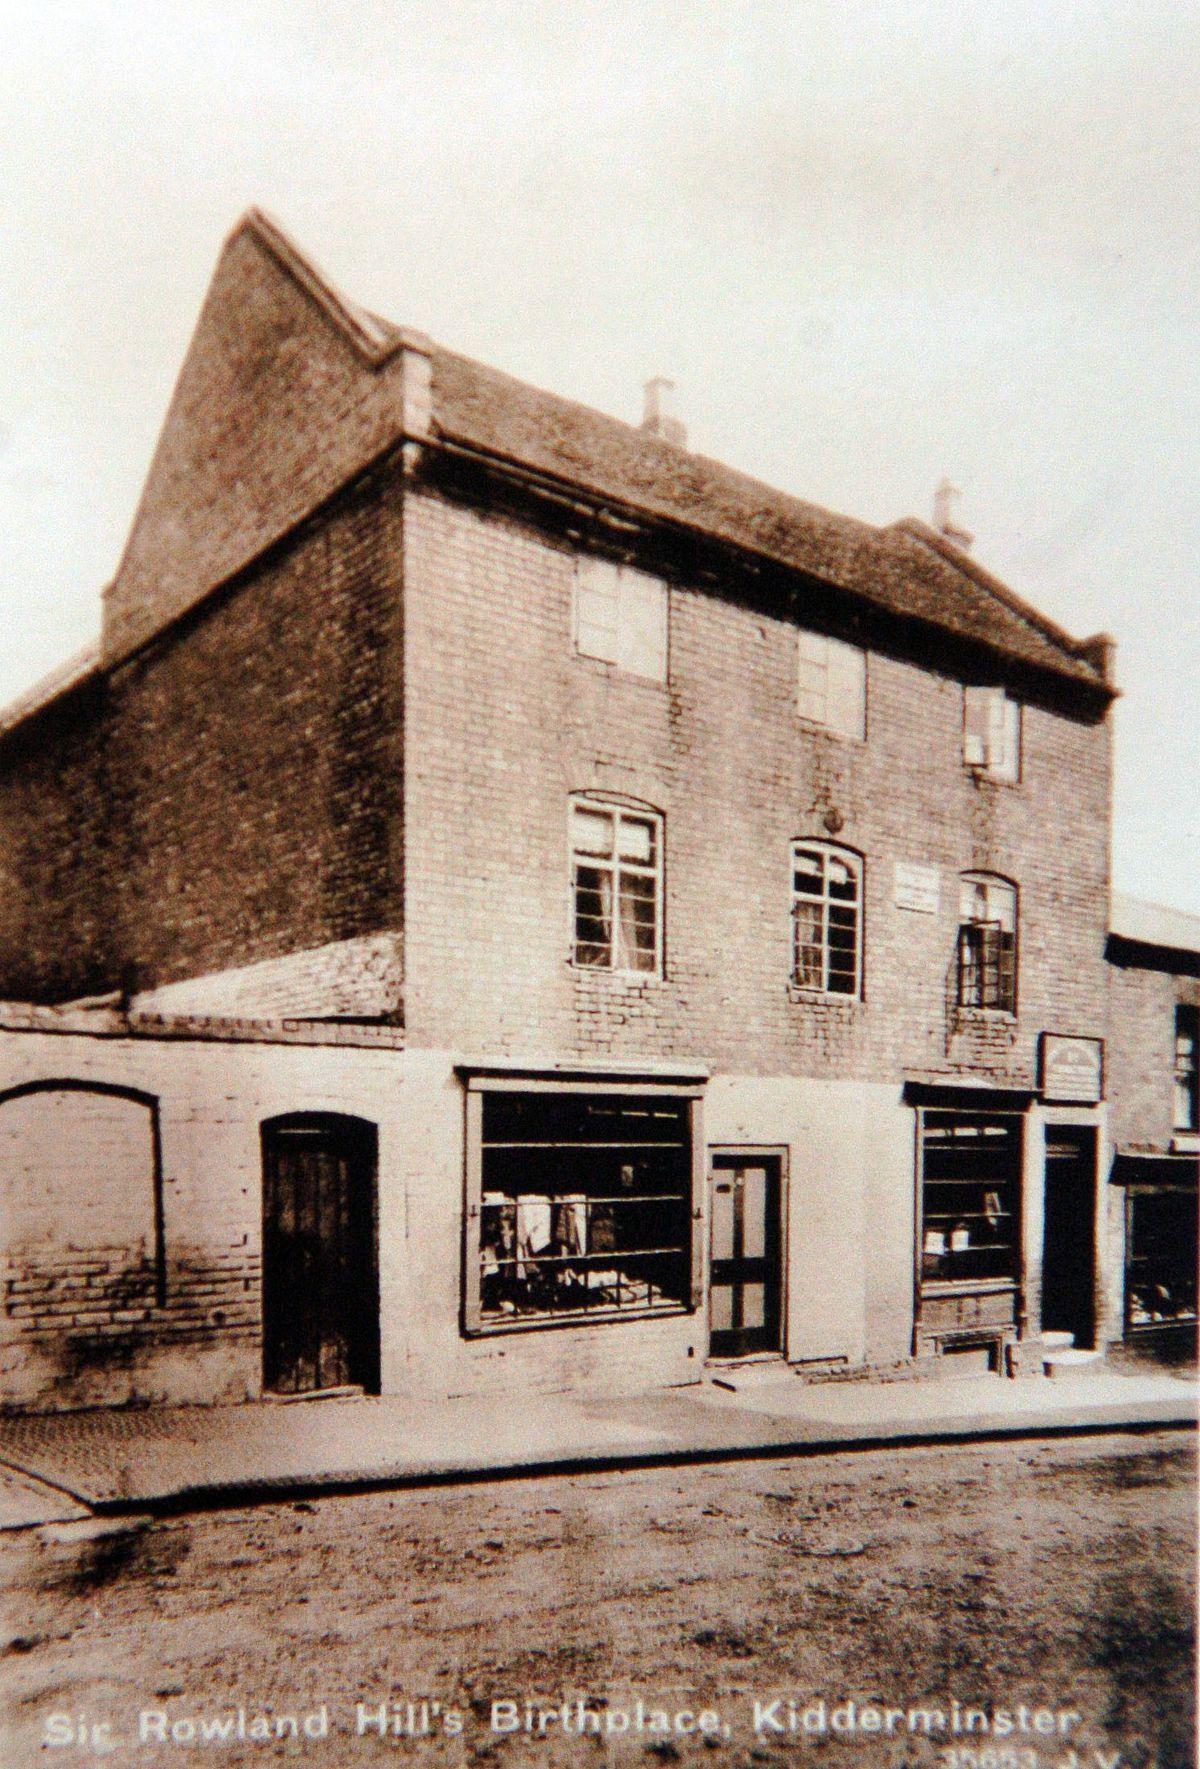 Rowland Hill was born in Blackwell Street, Kidderminster